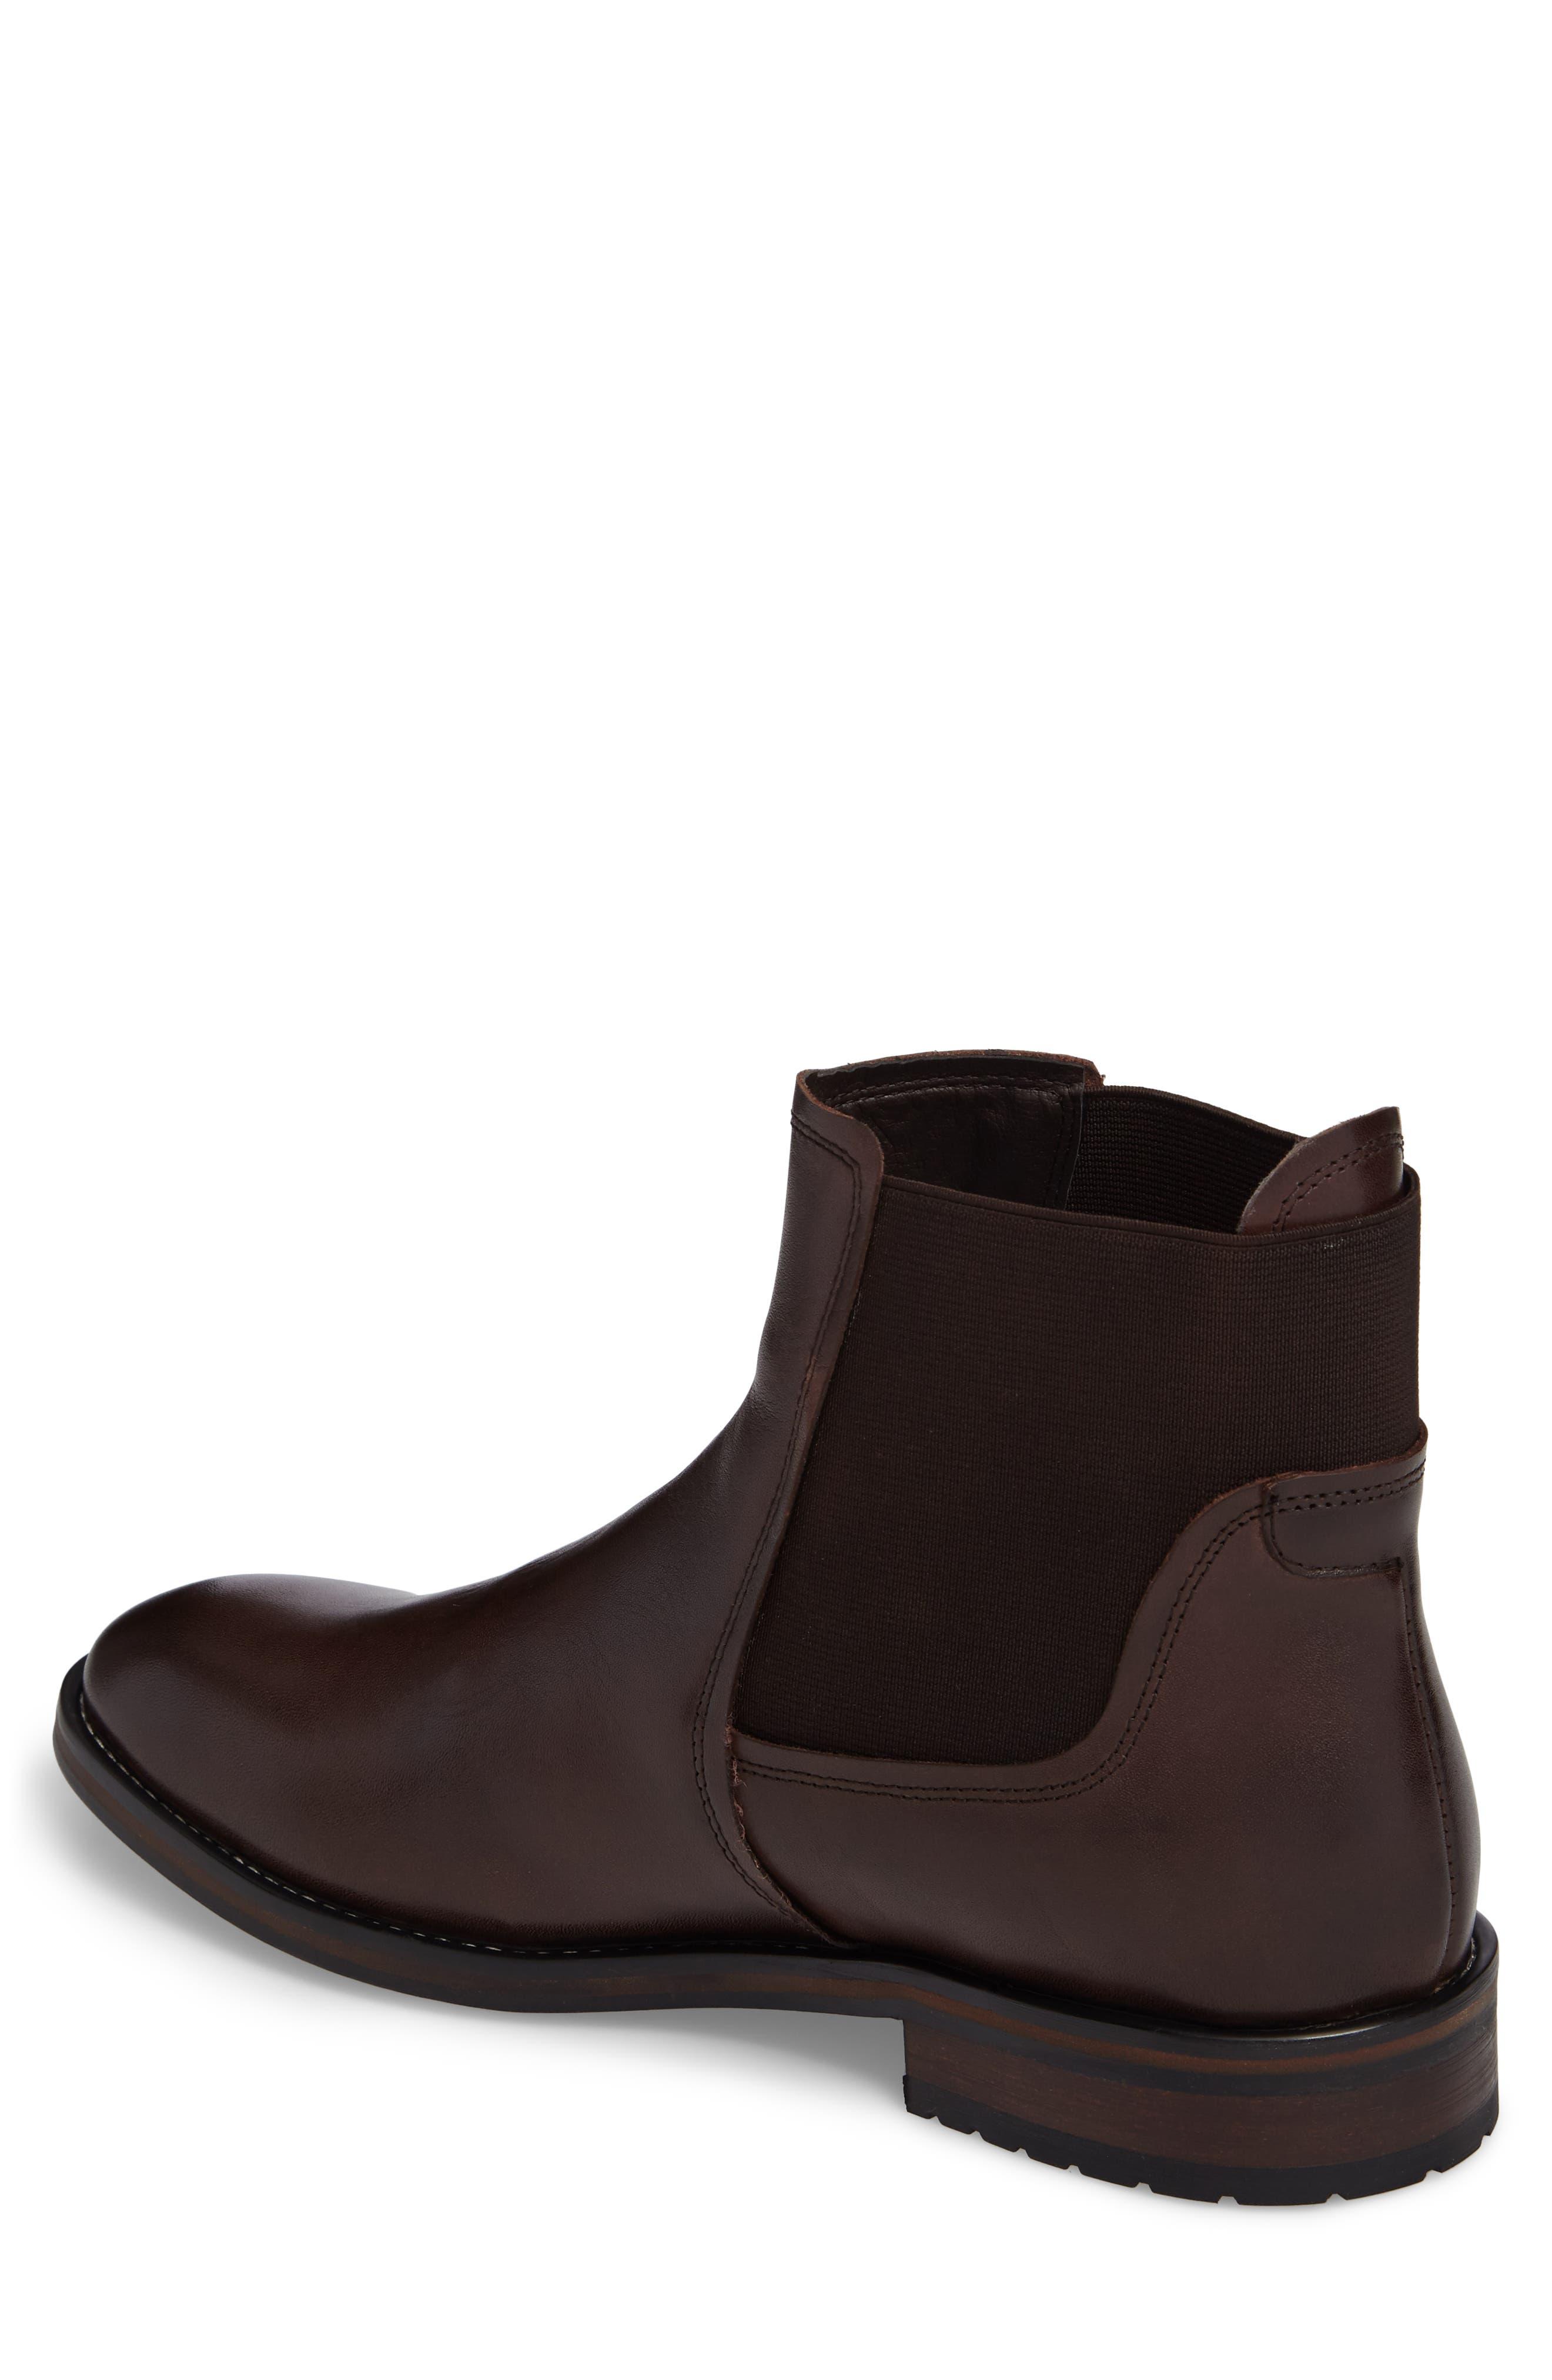 Alternate Image 2  - English Laundry Belmont Chelsea Boot (Men)